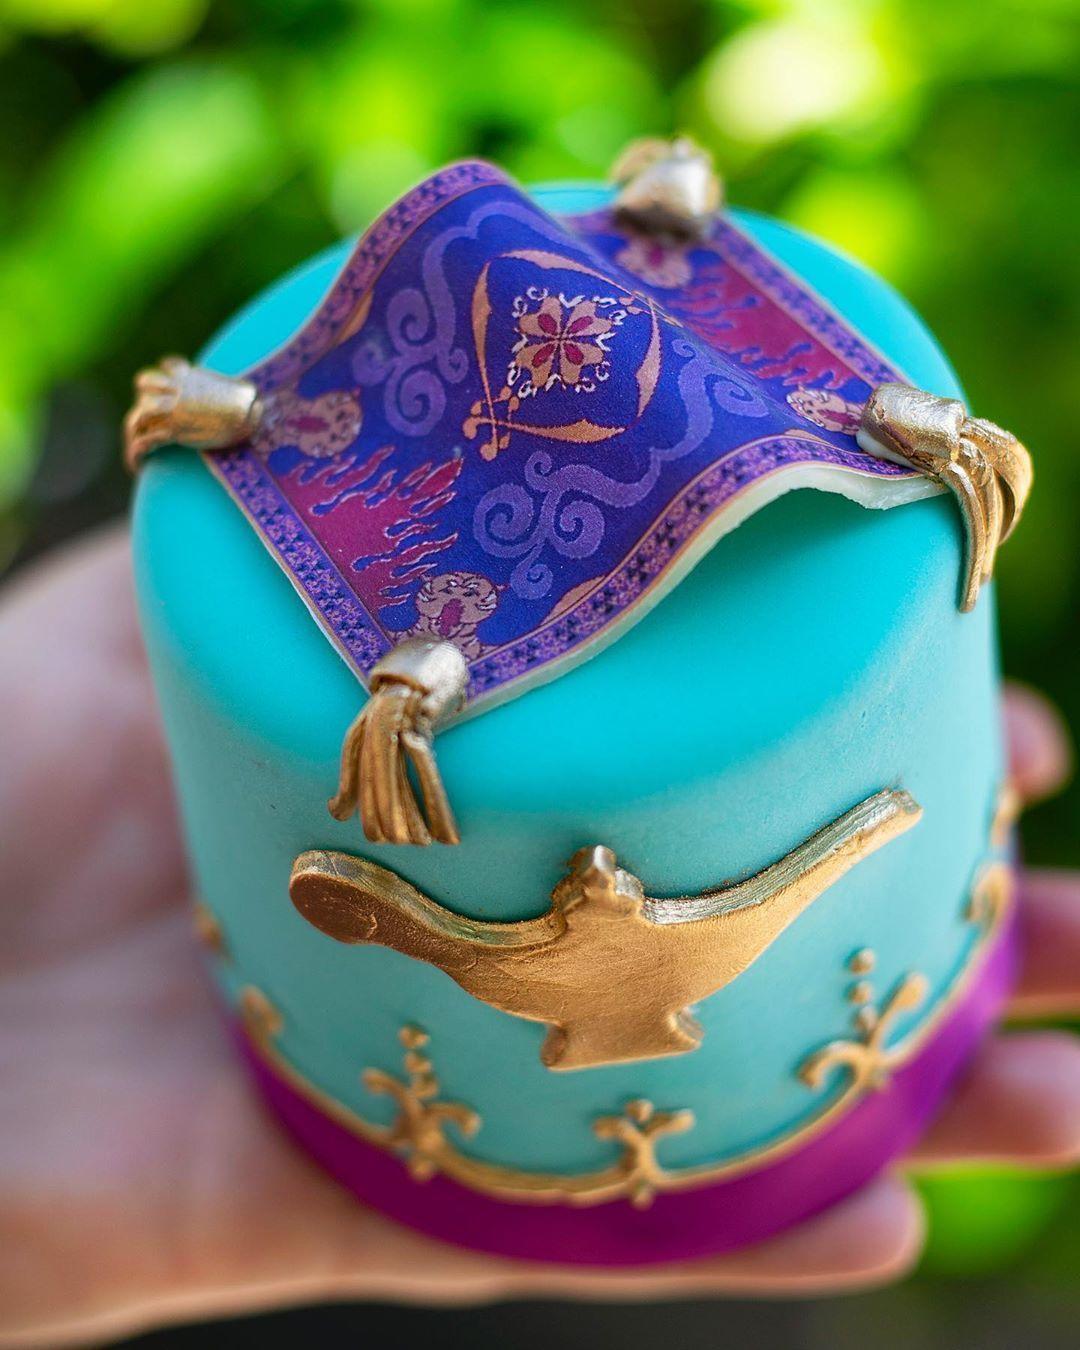 Sambut Film Aladdin, Disney Luncurkan Cupcake Super Gemas